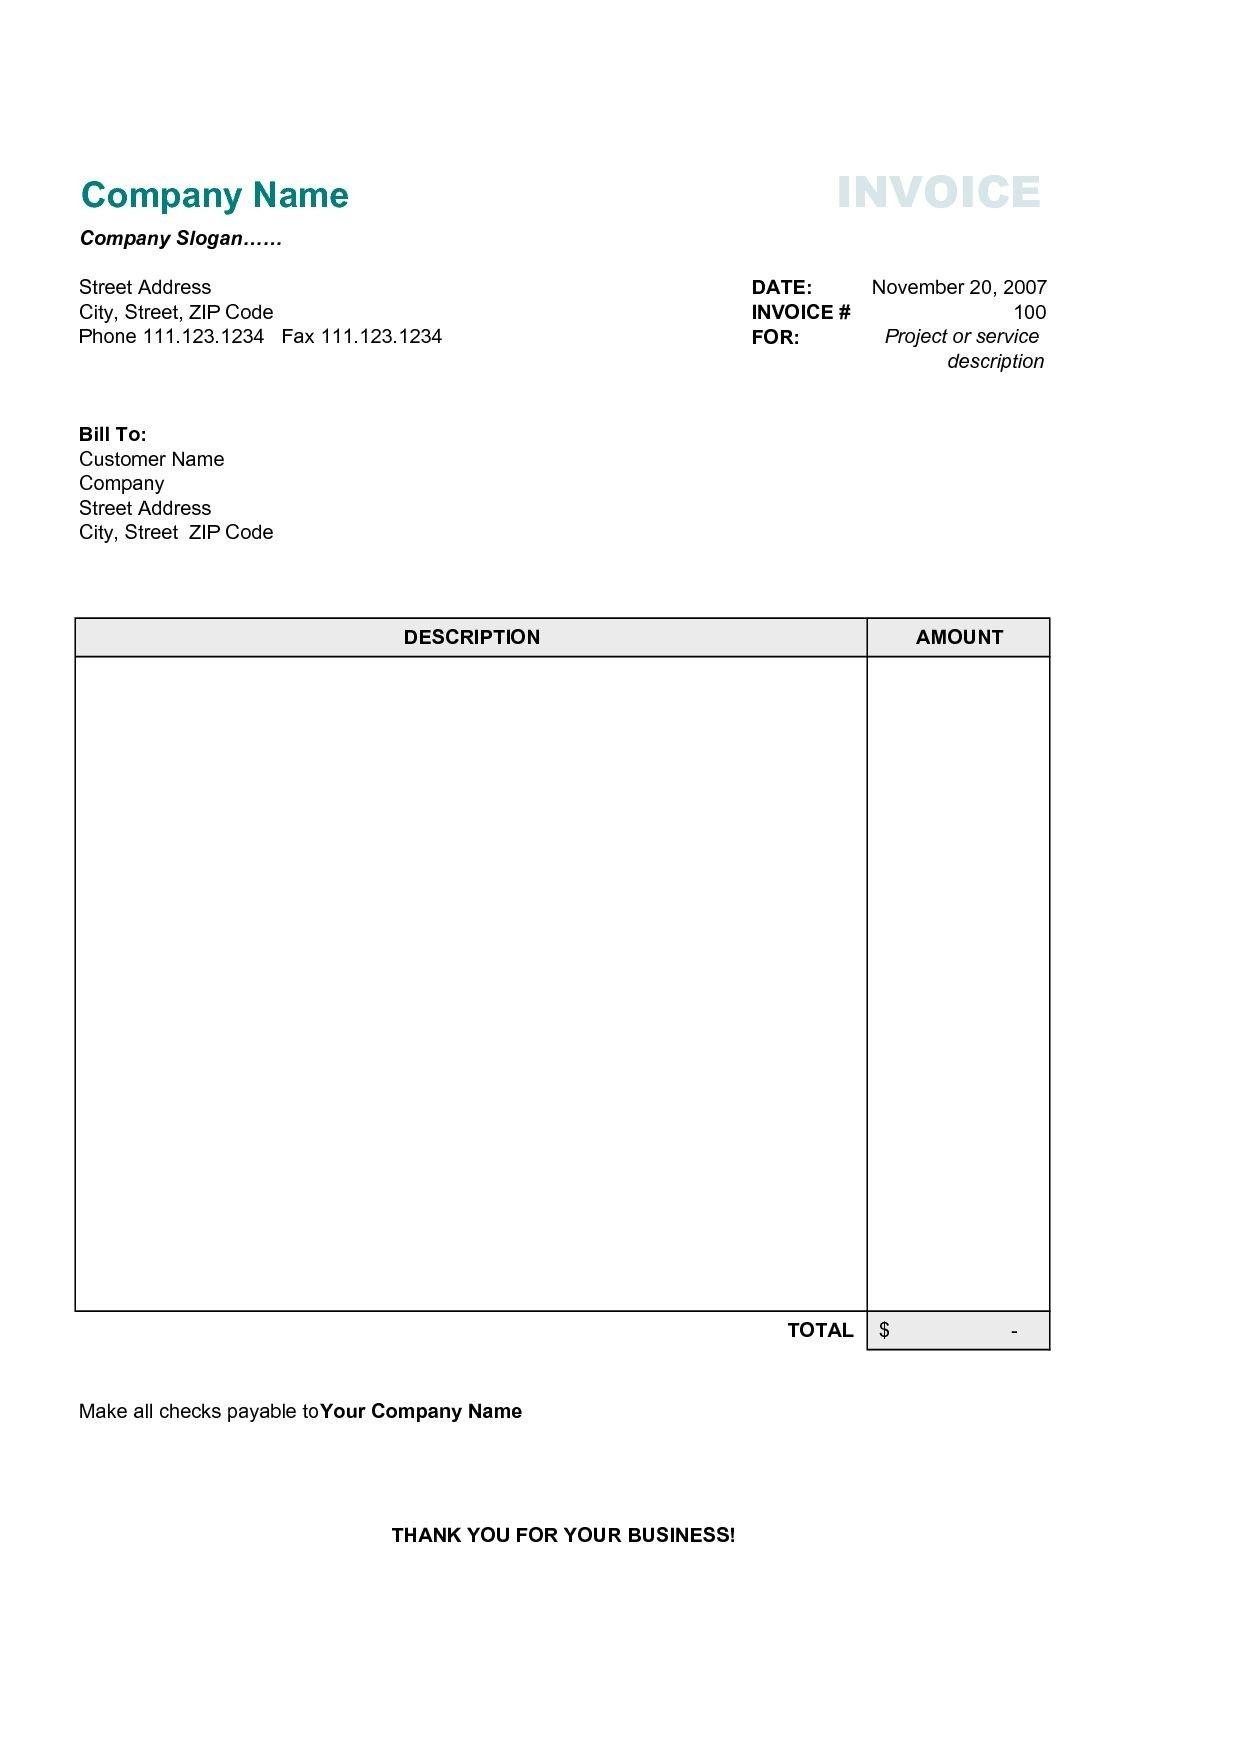 New Printable Invoice Templates Xls Xlsformat Xlstemplates Xlstemplate Invoice Template Word Invoice Sample Invoice Template